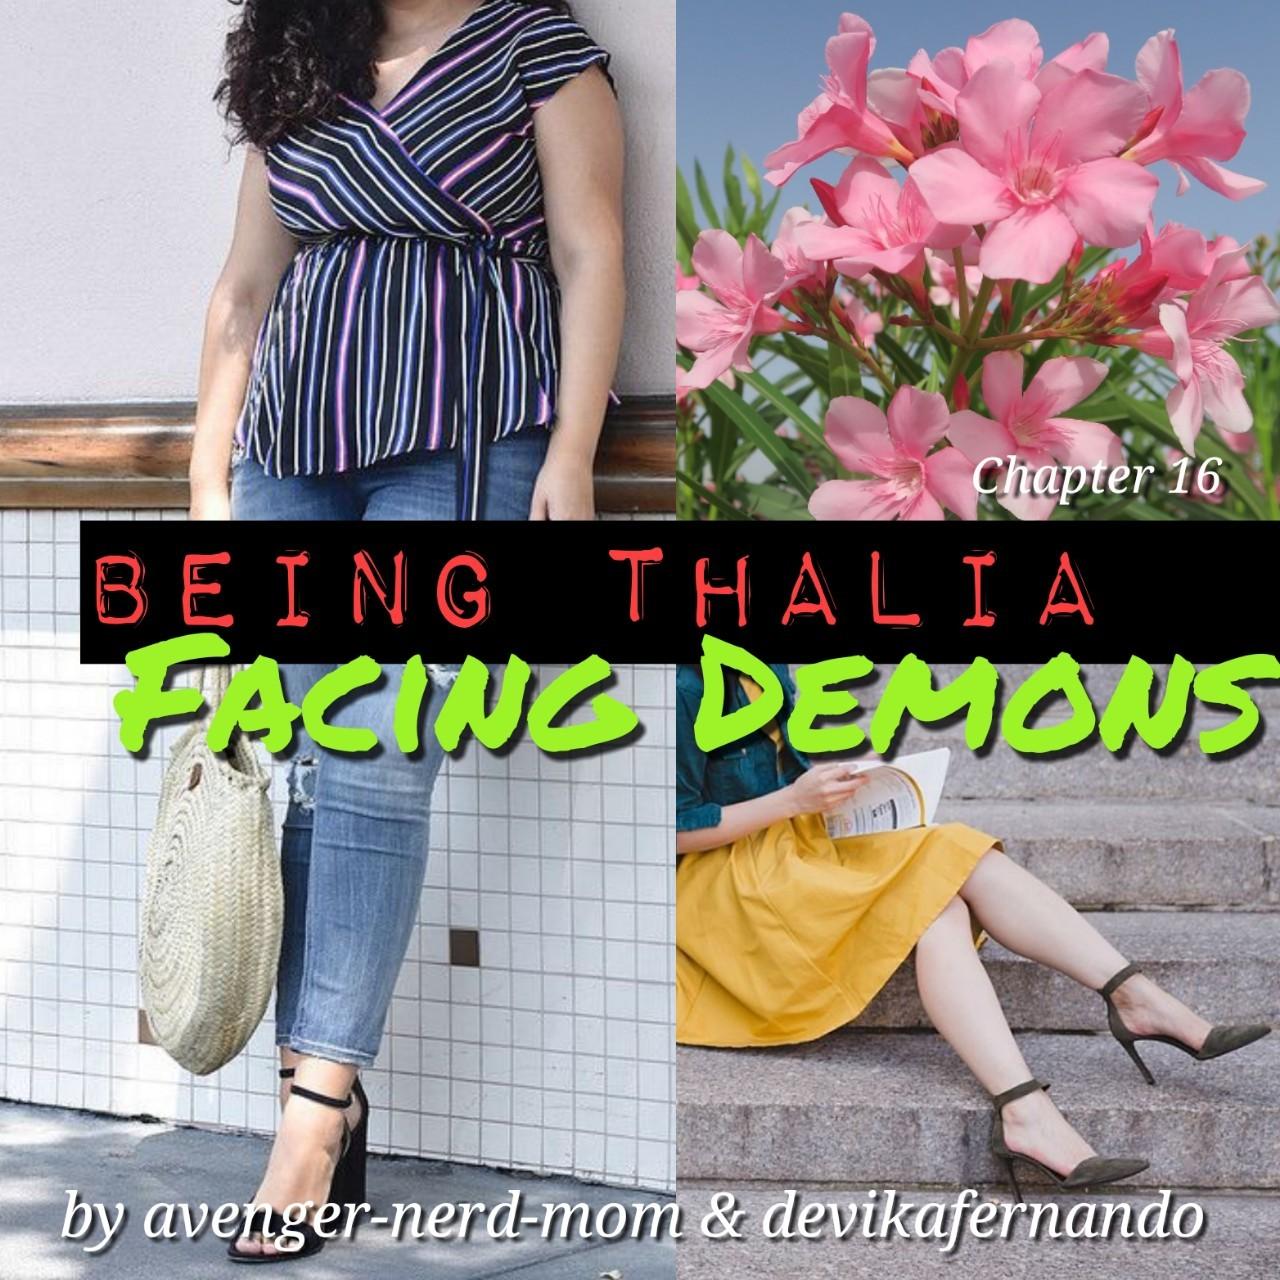 ch 16 Facing Demons Feb 24 2019